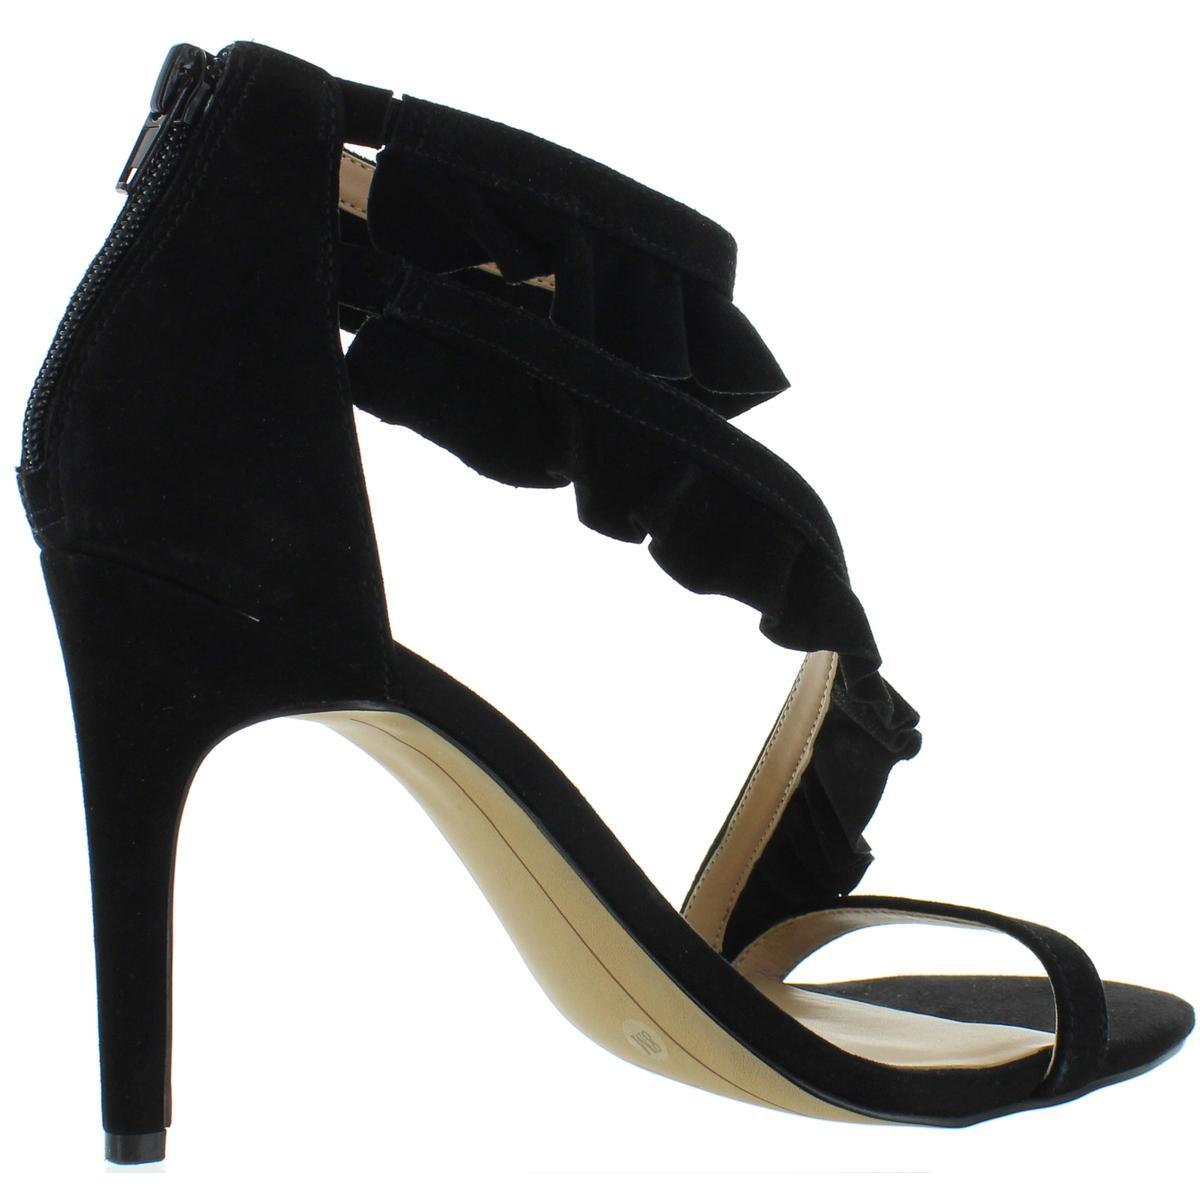 INC-Womens-Rezza-Suede-Heels-Open-Toe-Dress-Sandals-Shoes-BHFO-7122 thumbnail 4